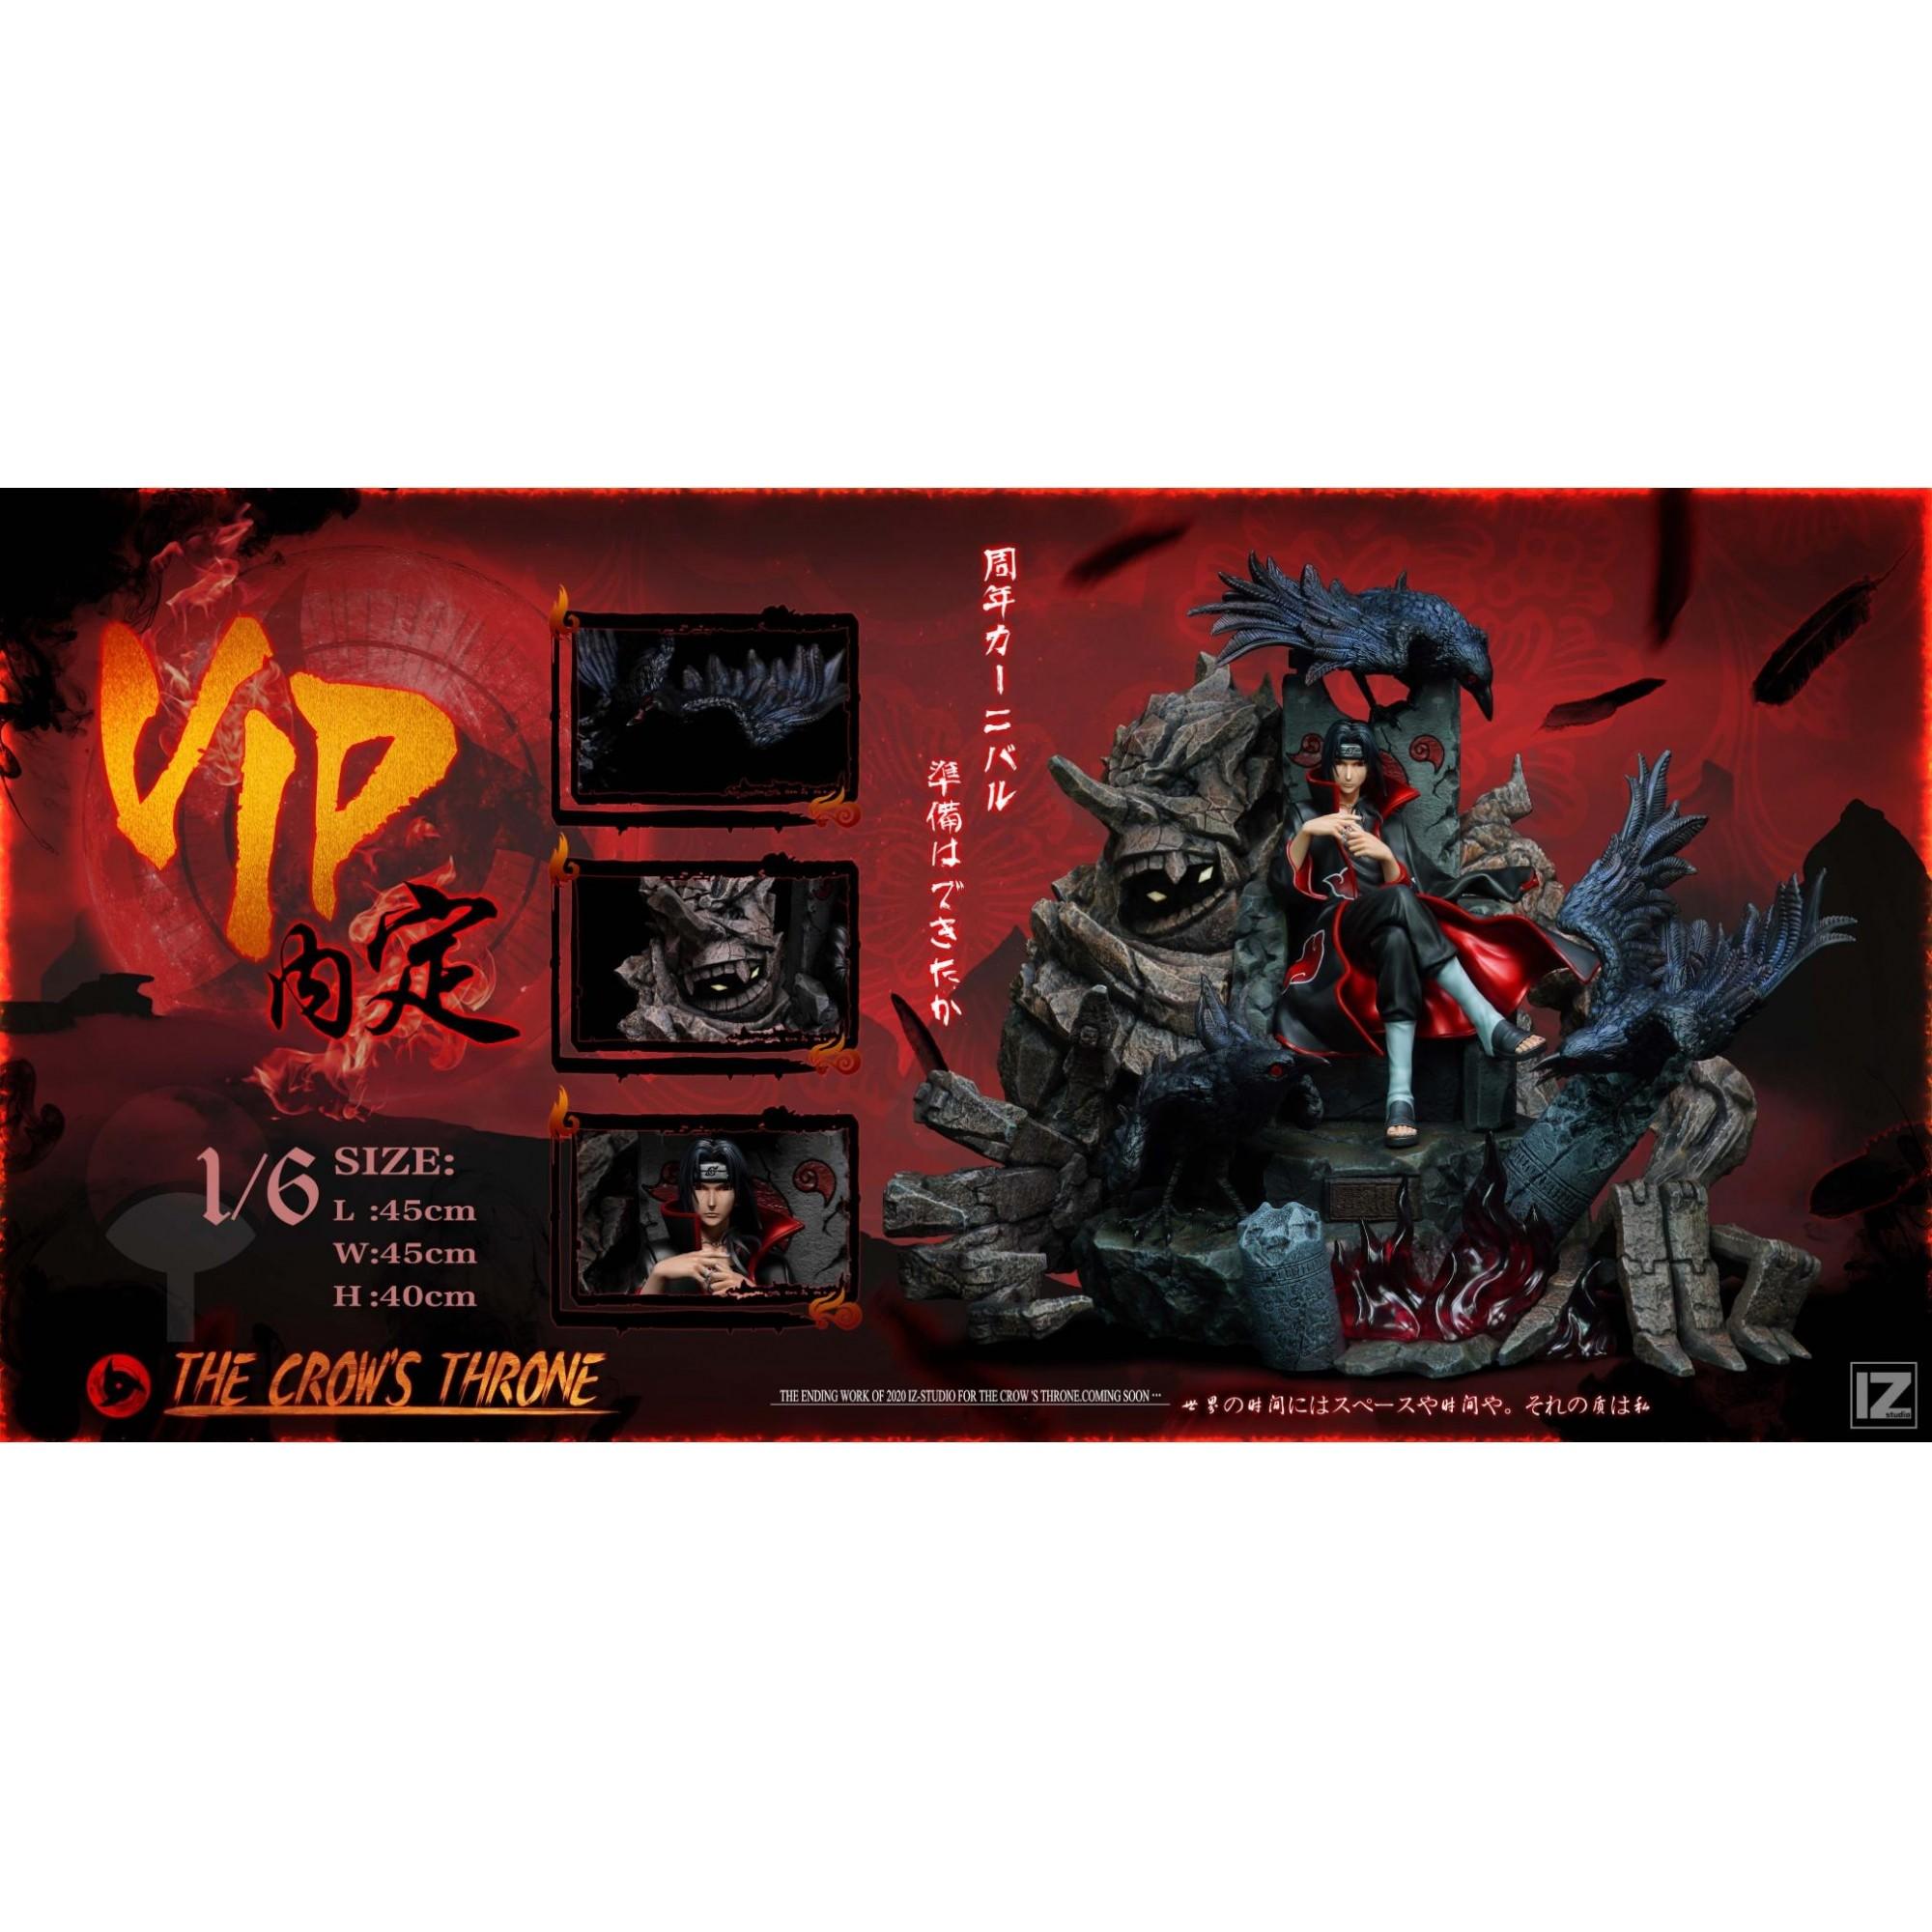 PRÉ VENDA: Estátua Itachi Uchiha No Trono: Naruto Shippuden Escala 1/6 - IZ Studio